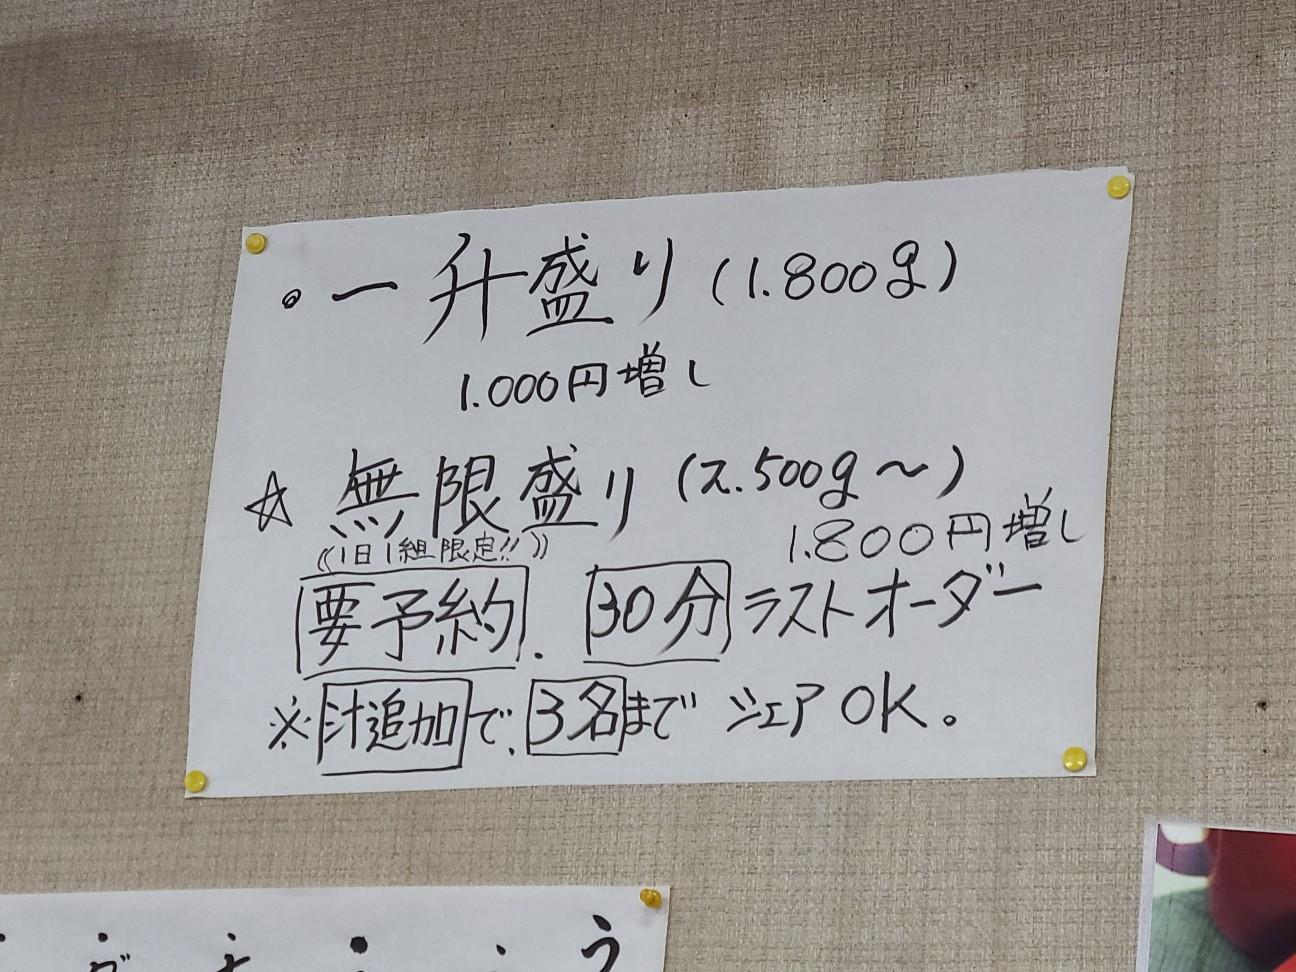 f:id:tt-suzukiit:20210505105706j:image